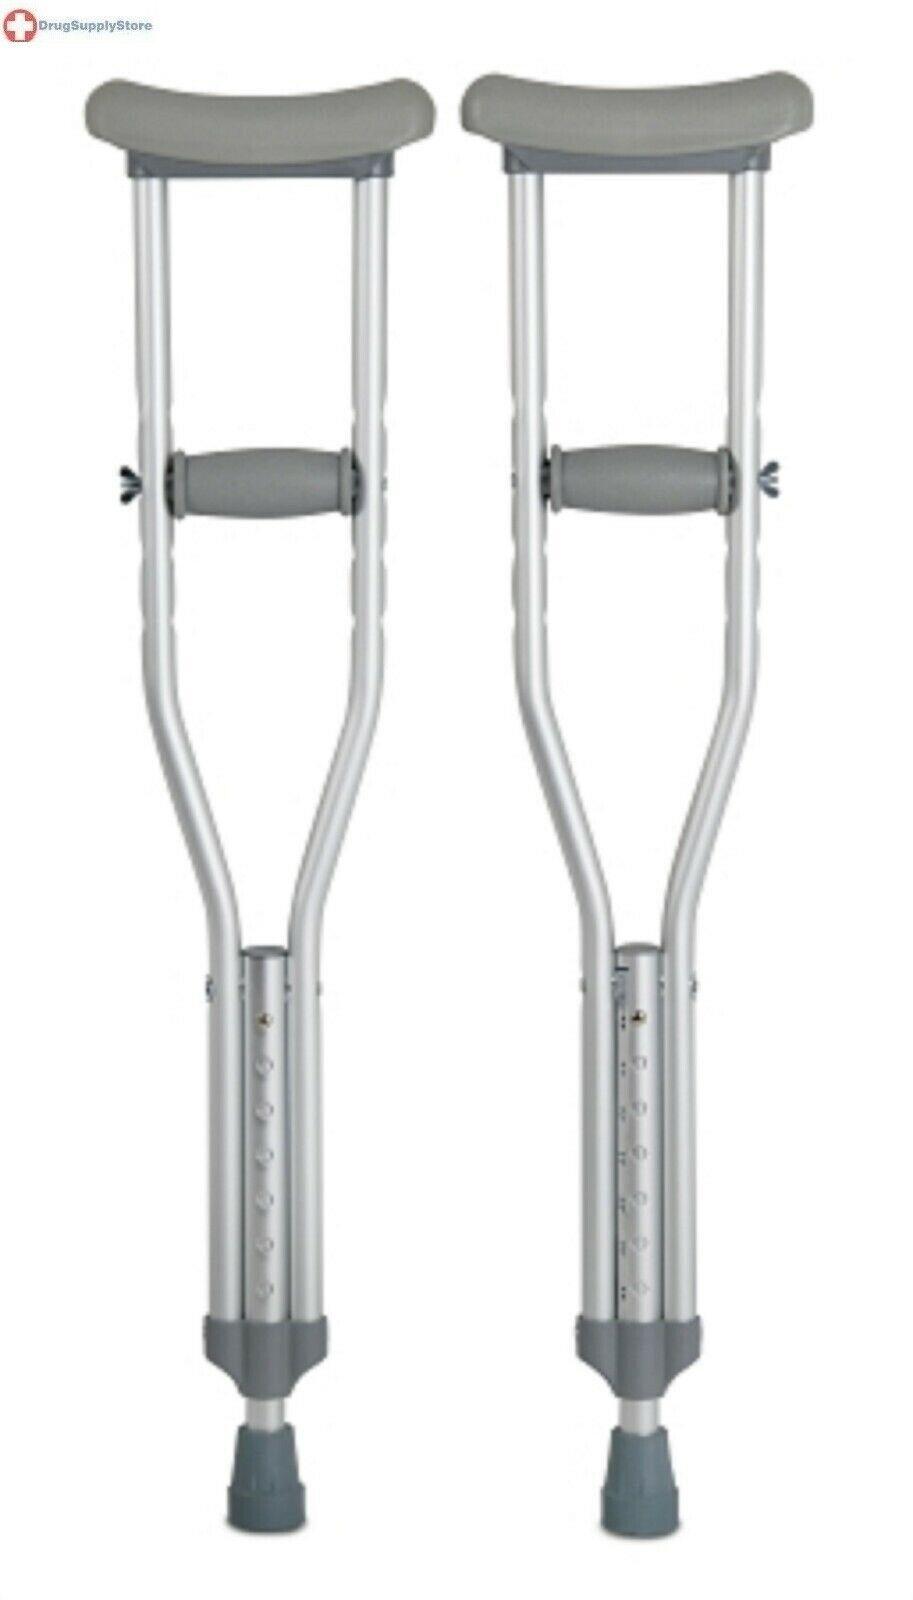 MCKDS Underarm Crutch McKesson Aluminum Child 350 lbs.